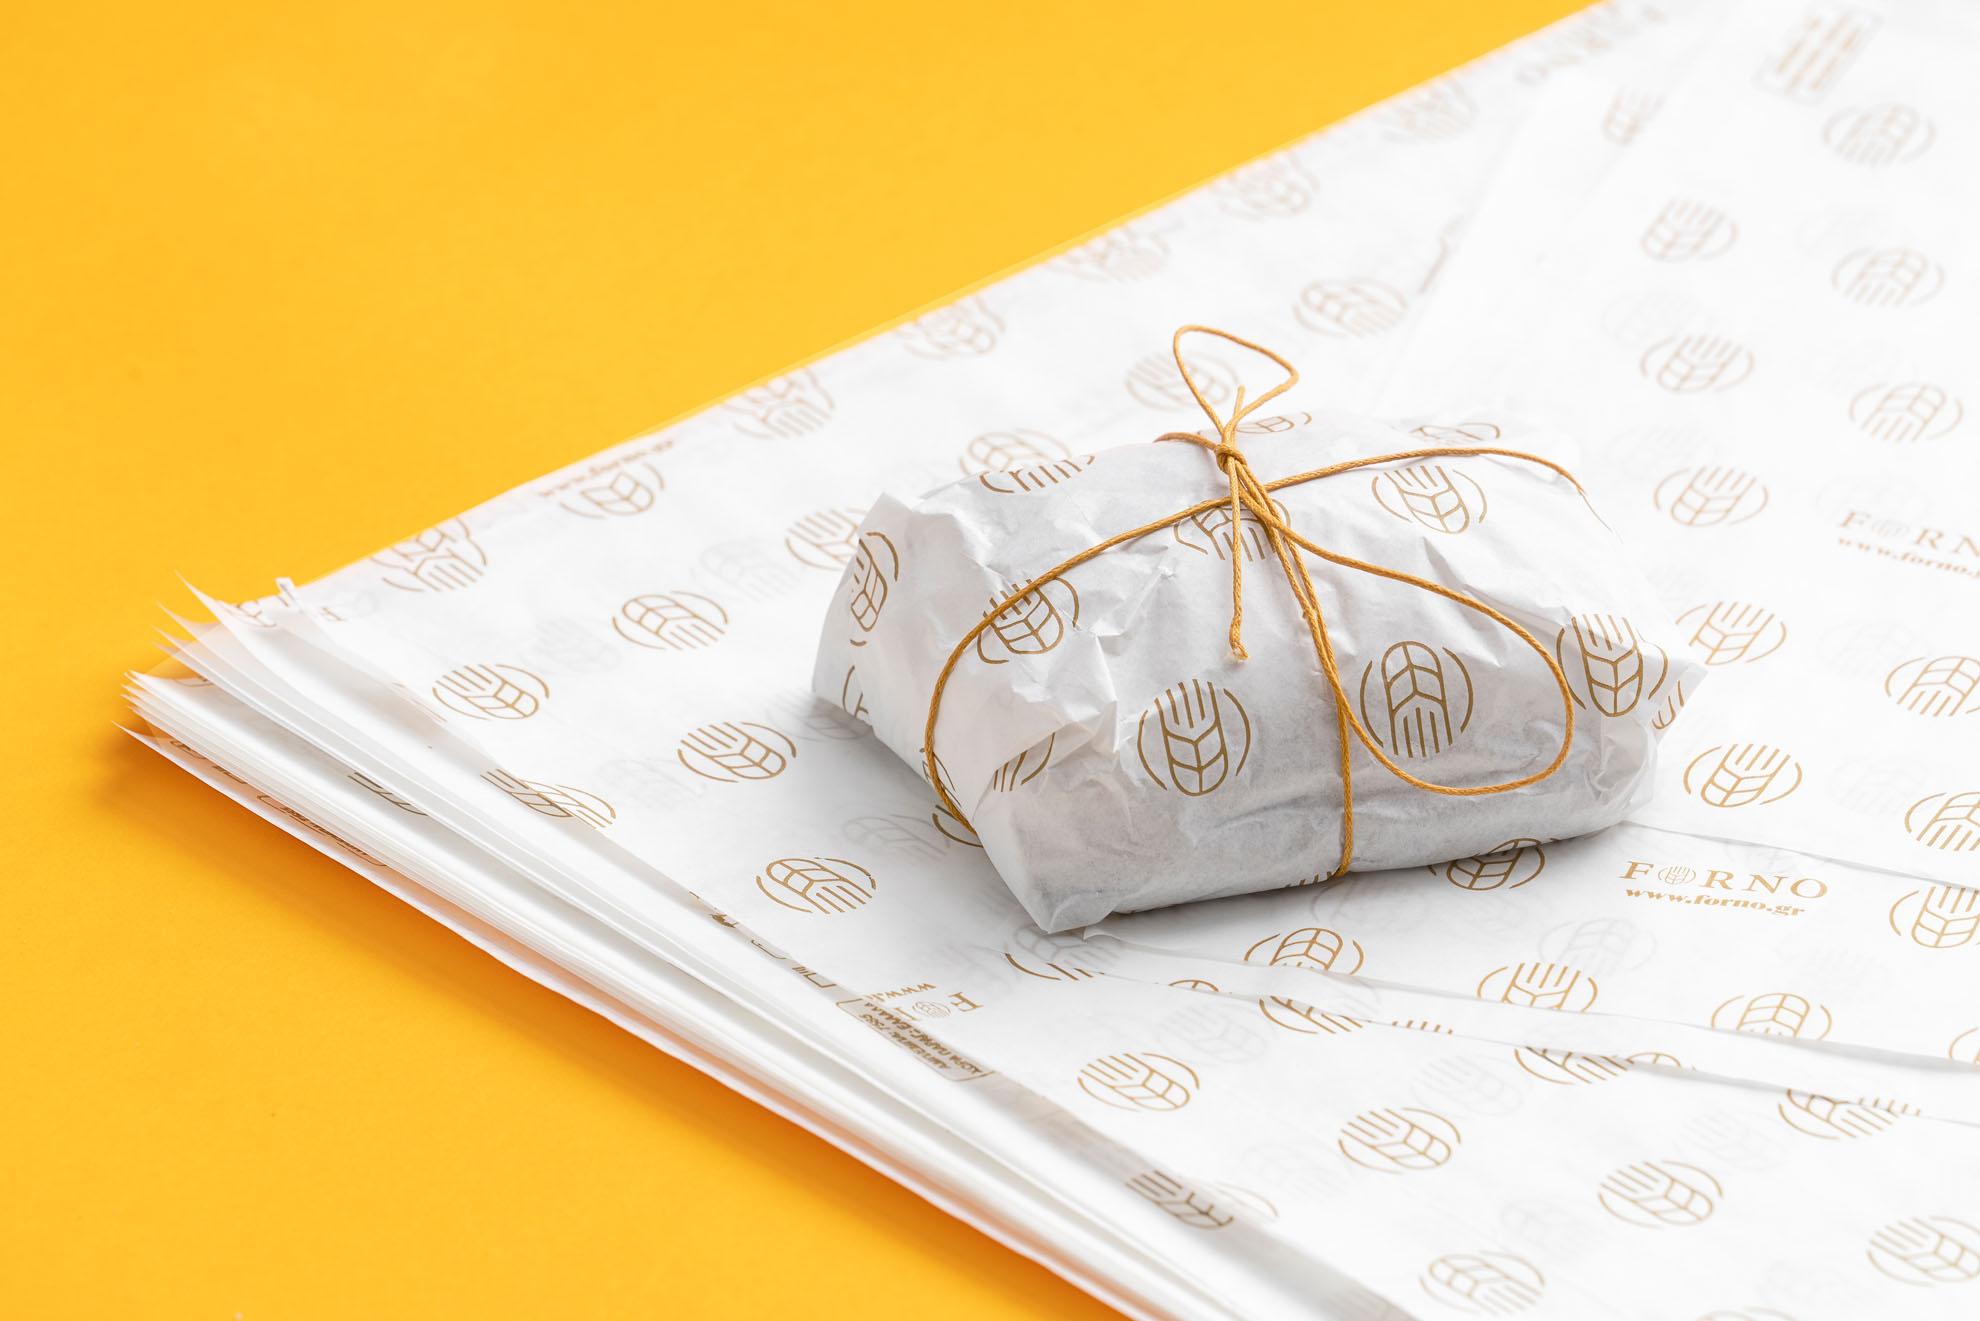 Forno Classico Bakery Rebranding Project / World Brand Design Society